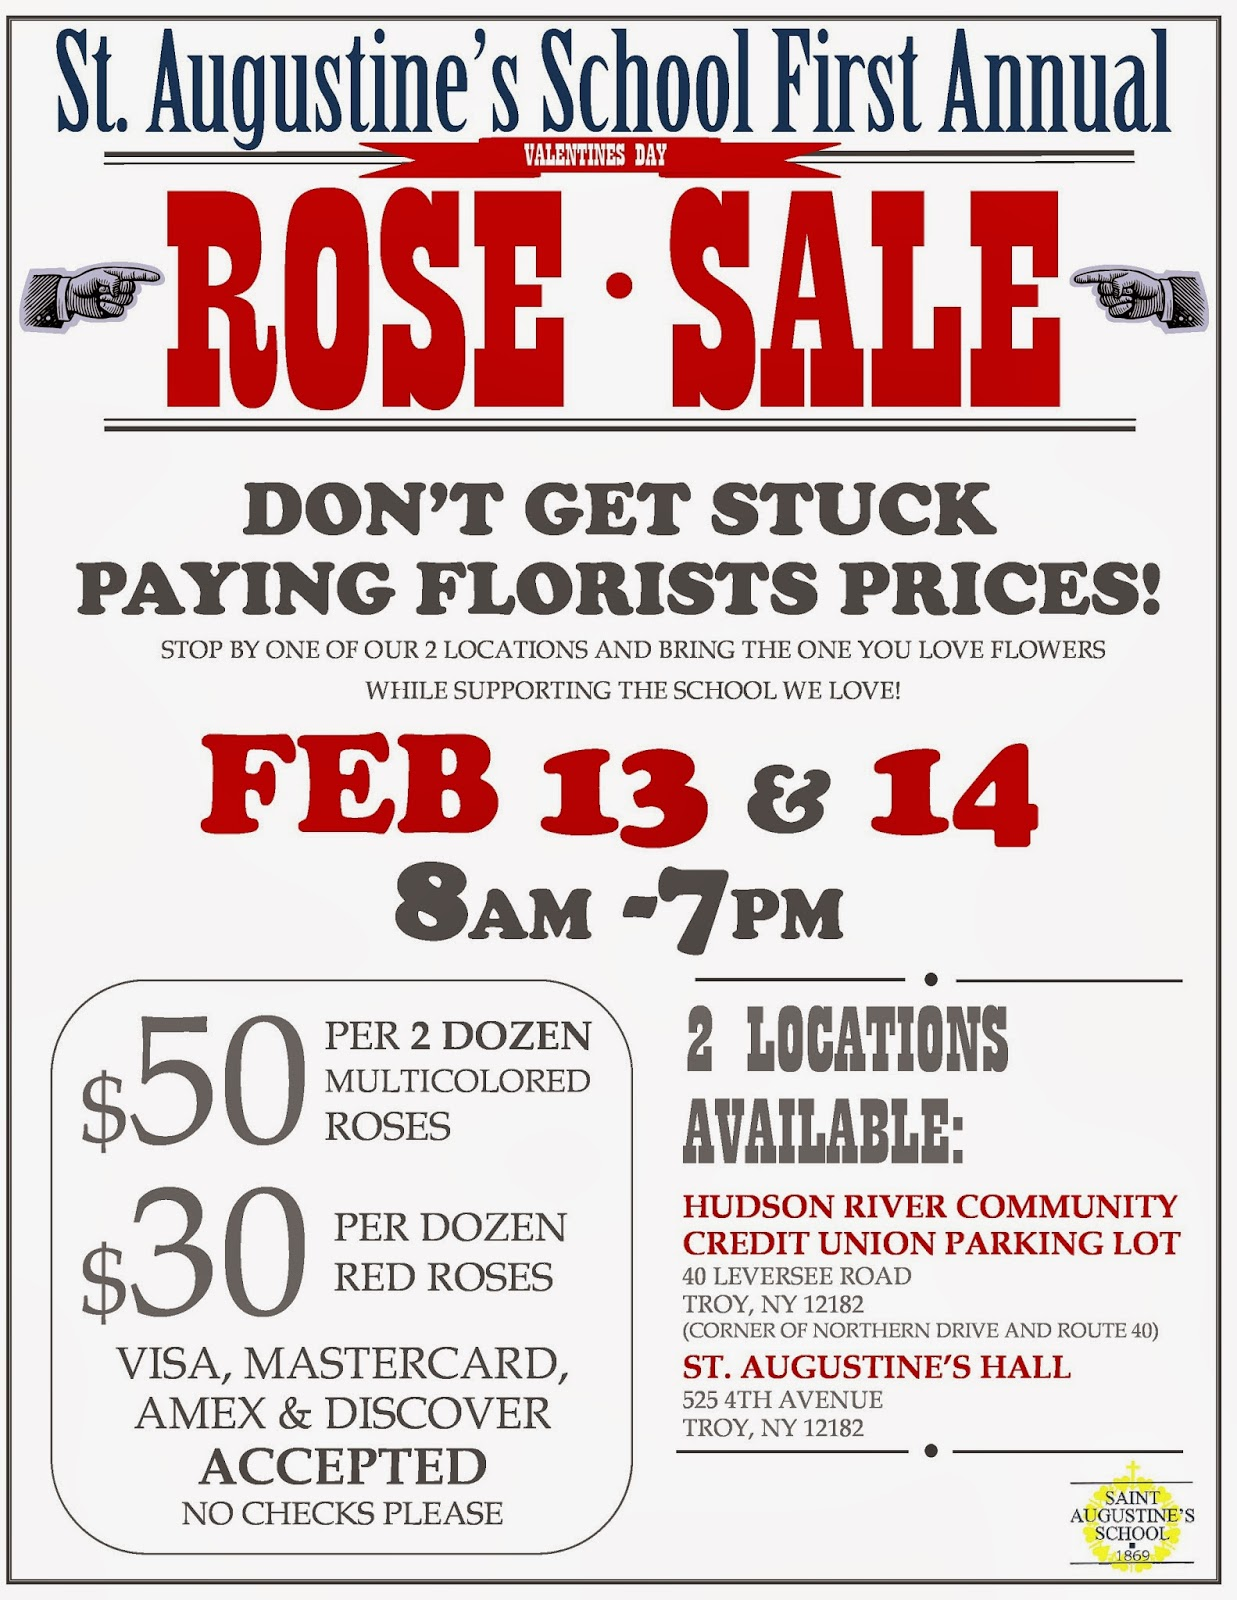 T Spin St Augustine S Valentine S Day Rose Sale